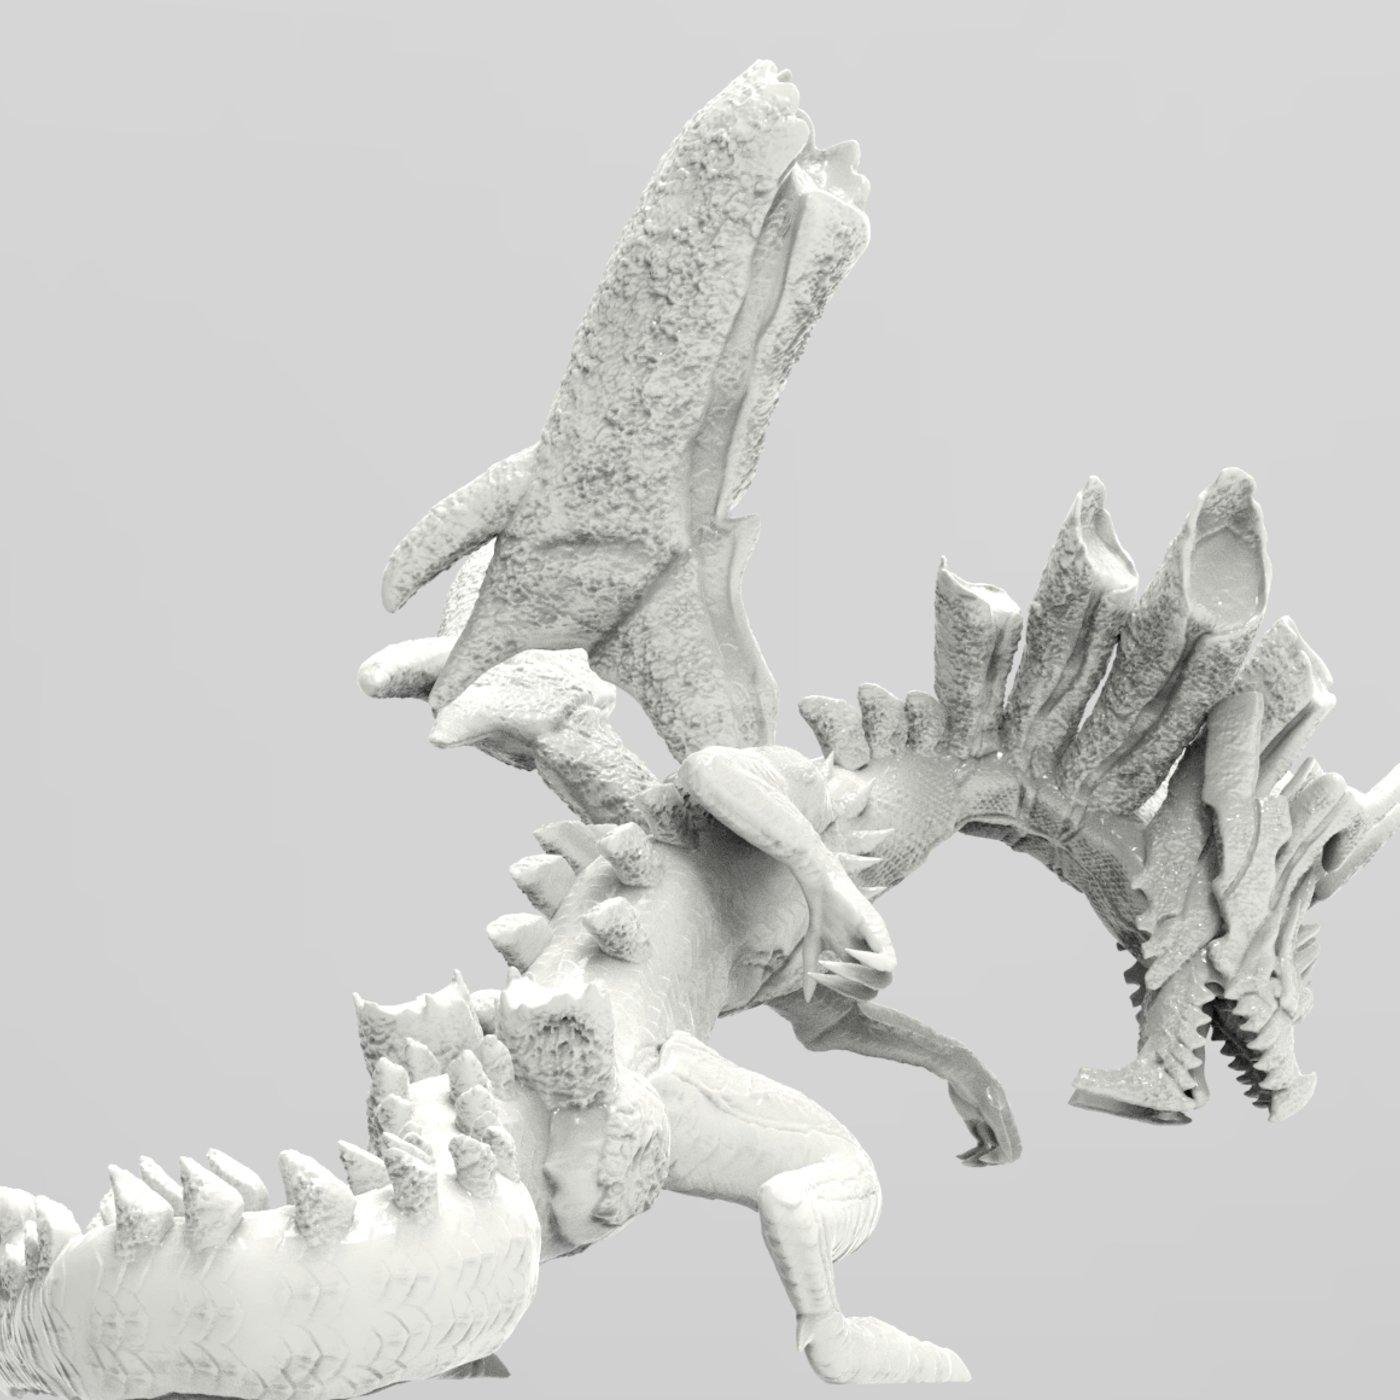 Dire Miralis from Monster Hunter 3